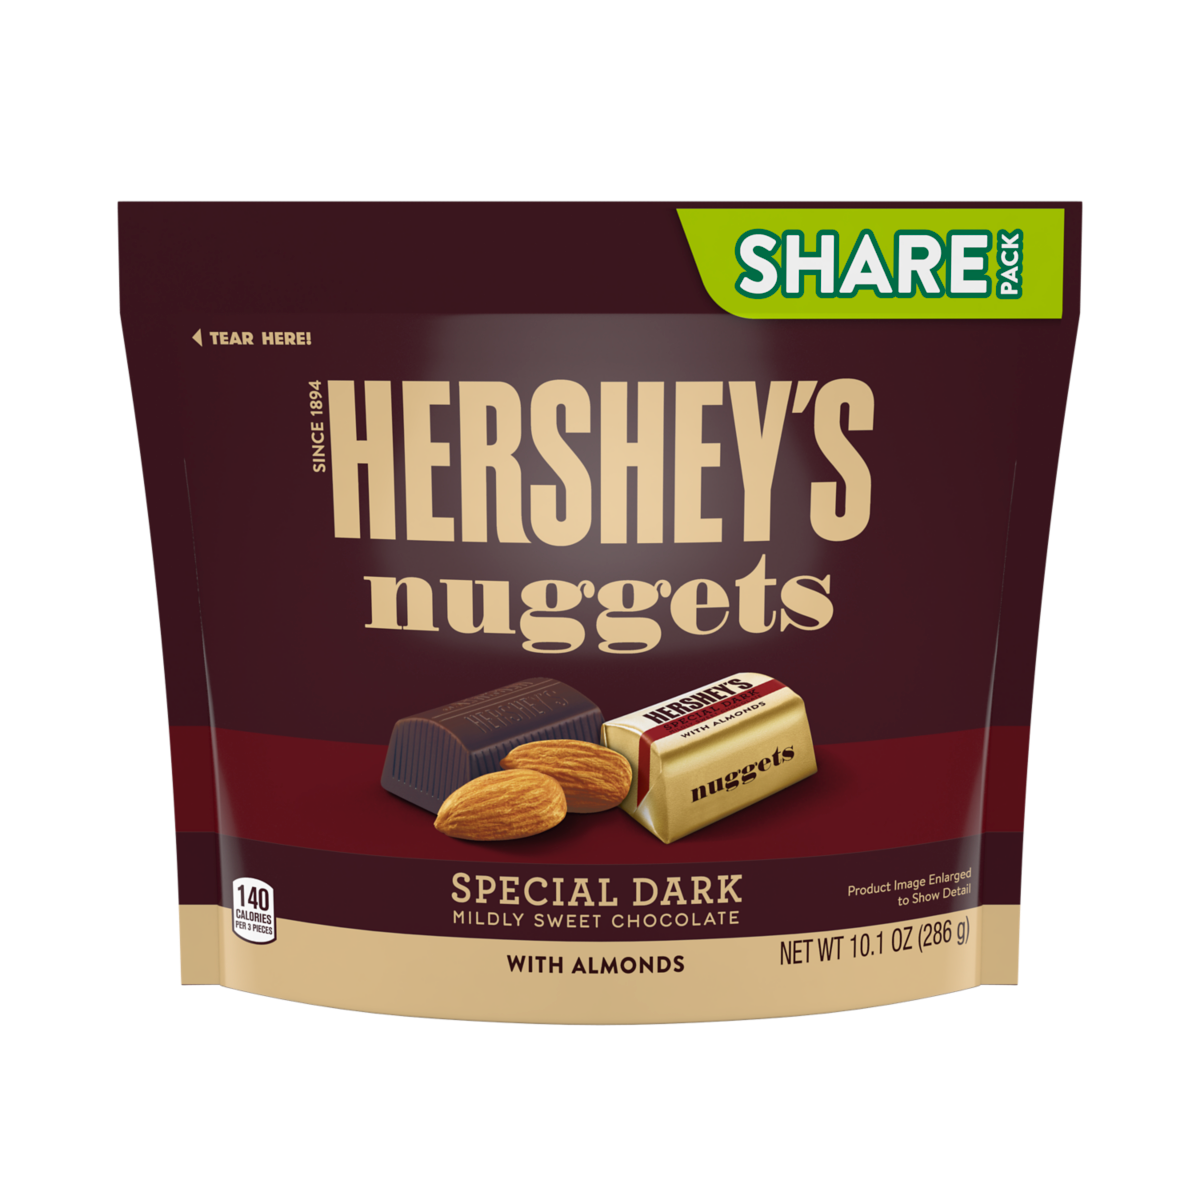 Hersheys Nuggets Dark Chocolate with Almonds Share Size - 10.1oz